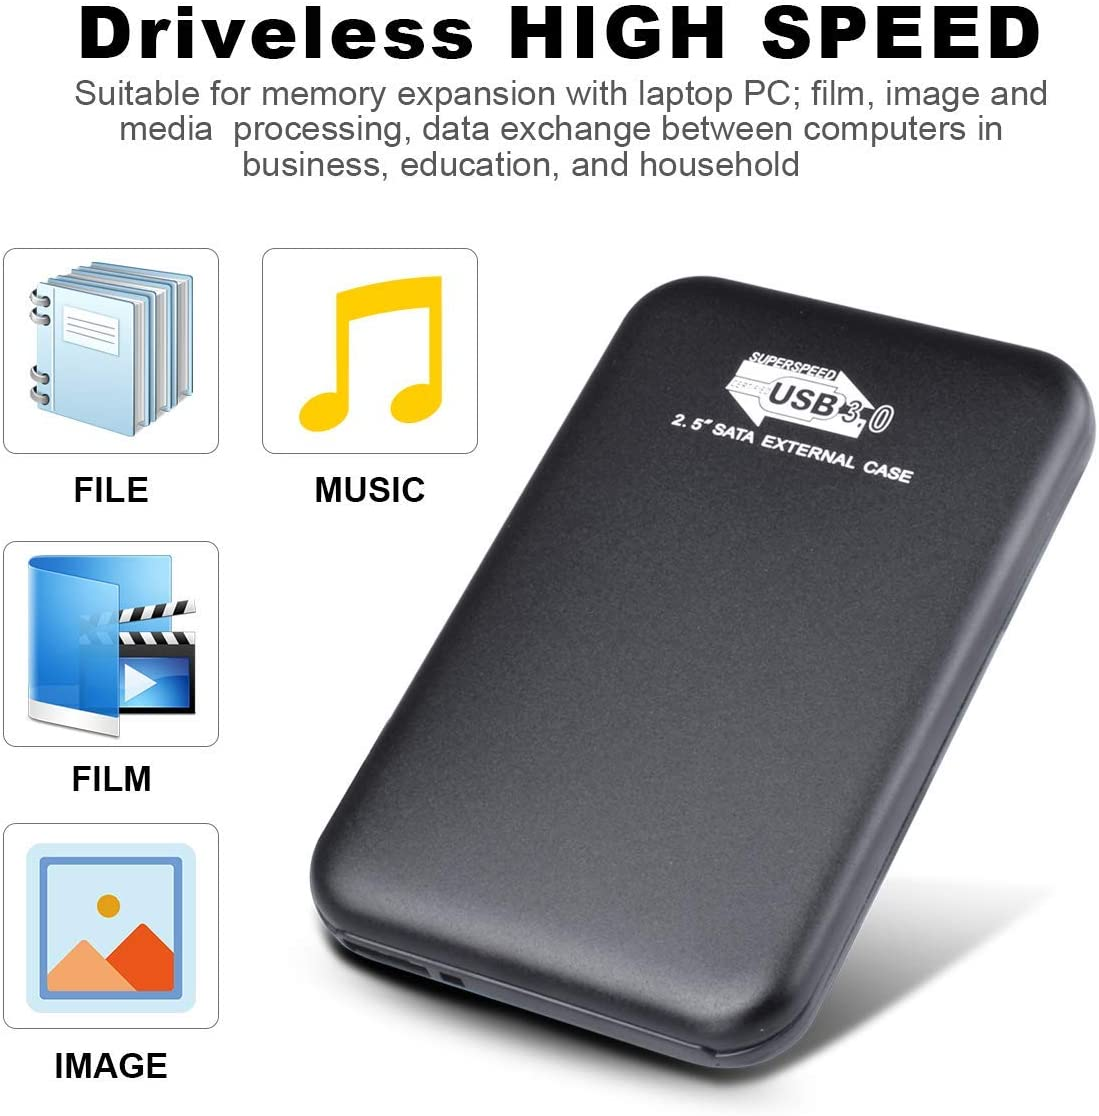 2TB, Black Laptop 1TB//2TB Portable External Hard Drive Ultra Thin External HDD USB 3.0 Hard Drive Compatible for PC Xbox 360 Mac,Desktop Xbox One PS4